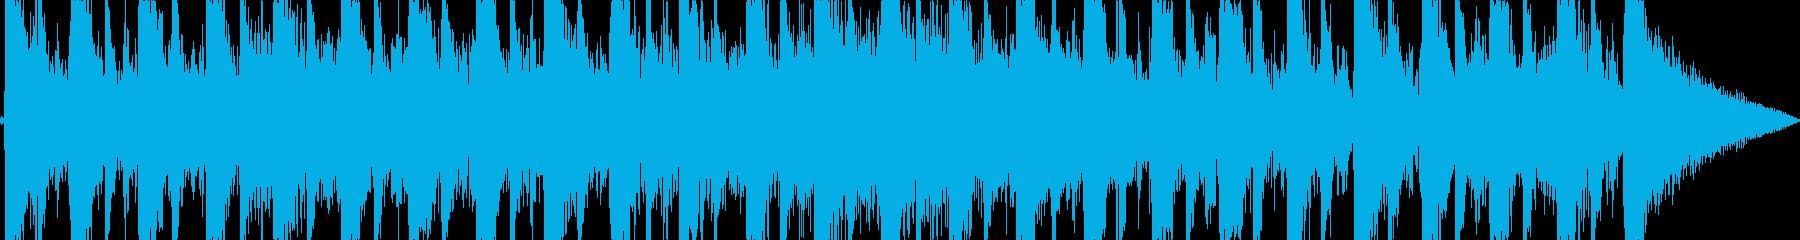 CM15秒 軽快なPOPの再生済みの波形